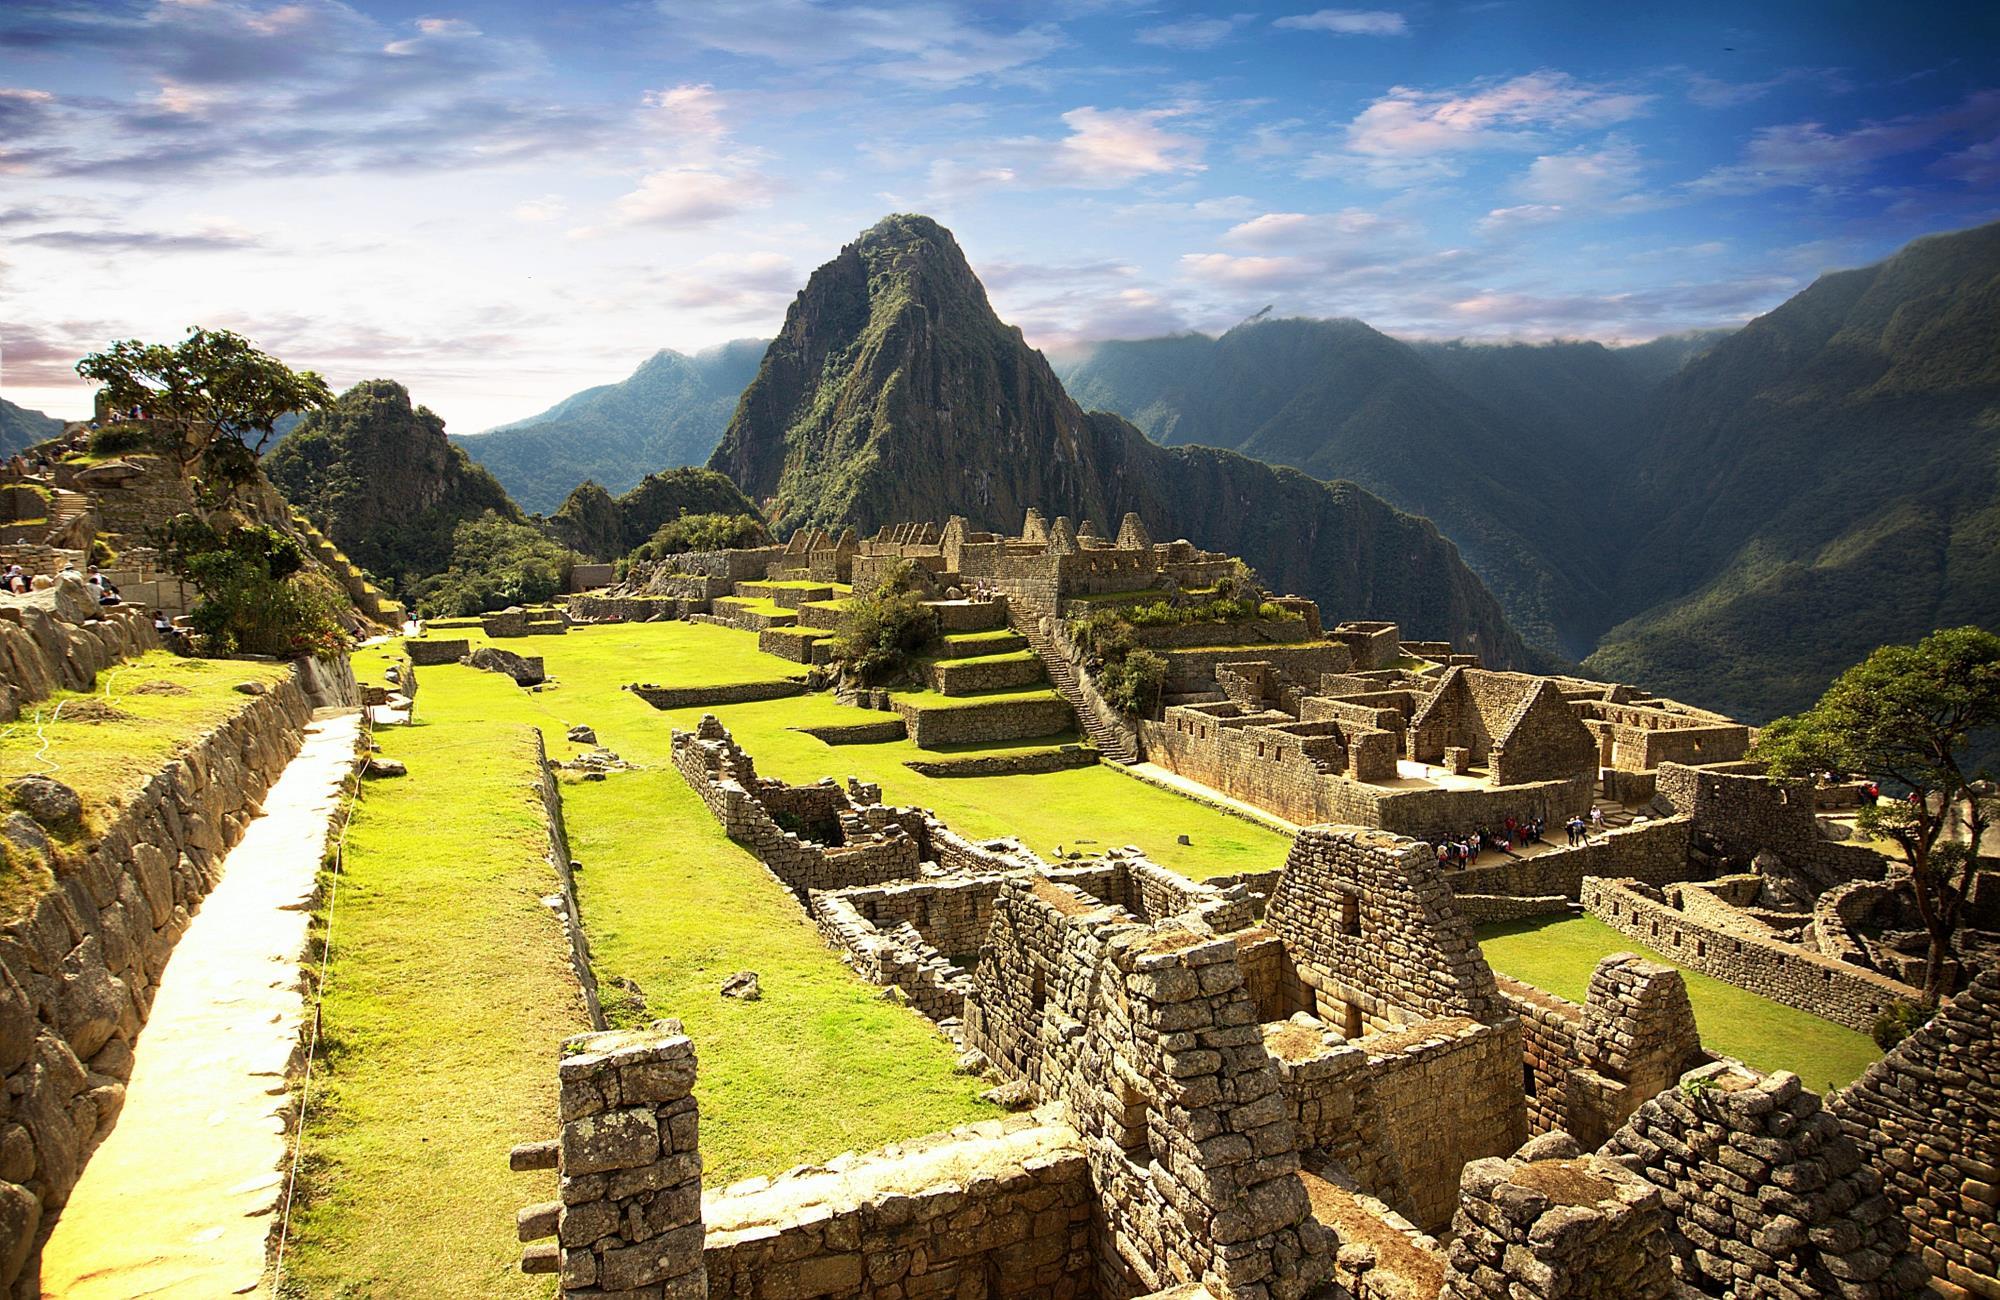 Voyage au Pérou - Machu Picchu - Amplitudes